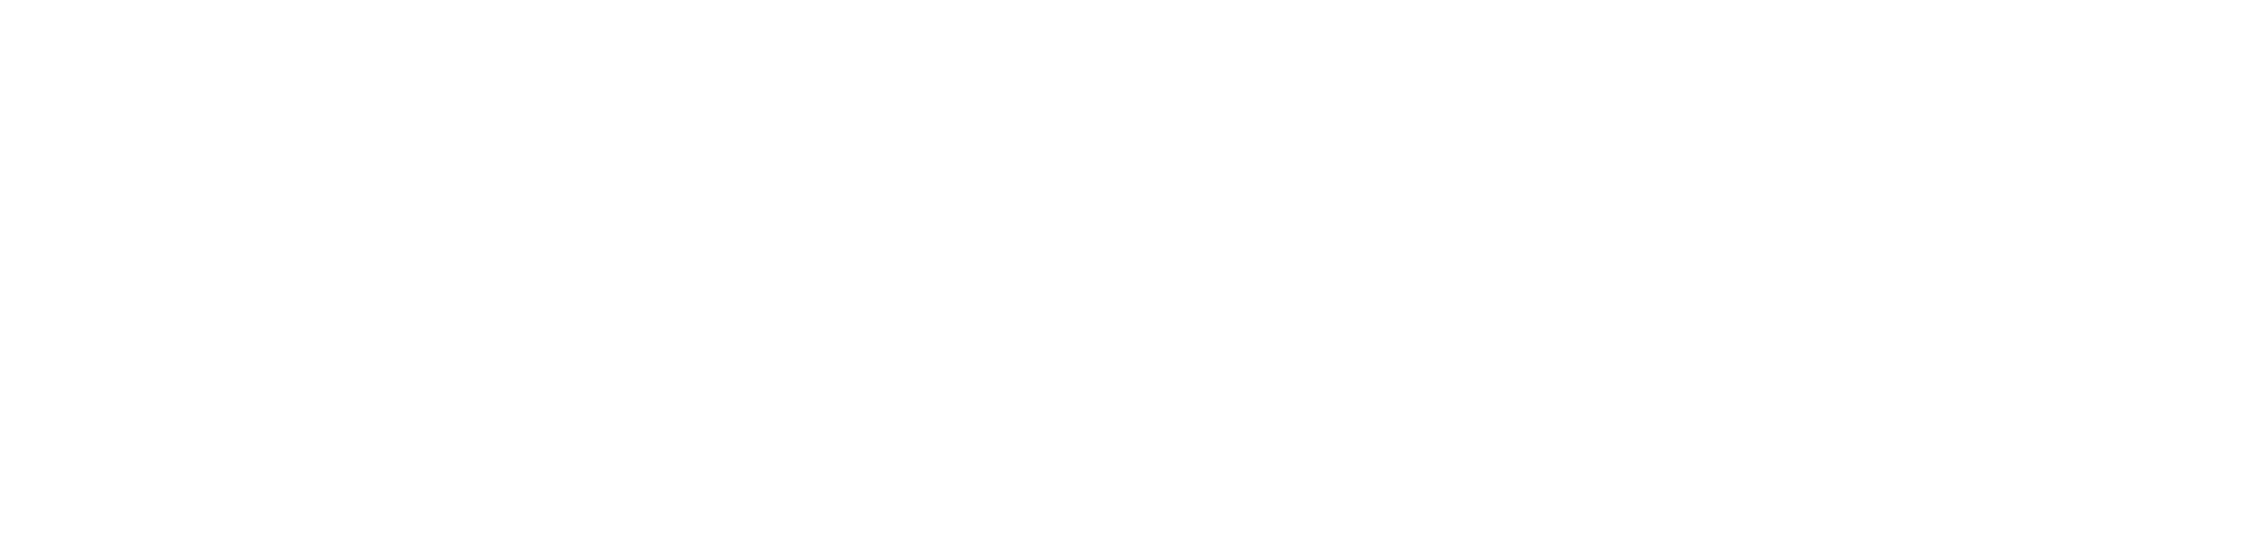 KeyShot Render.